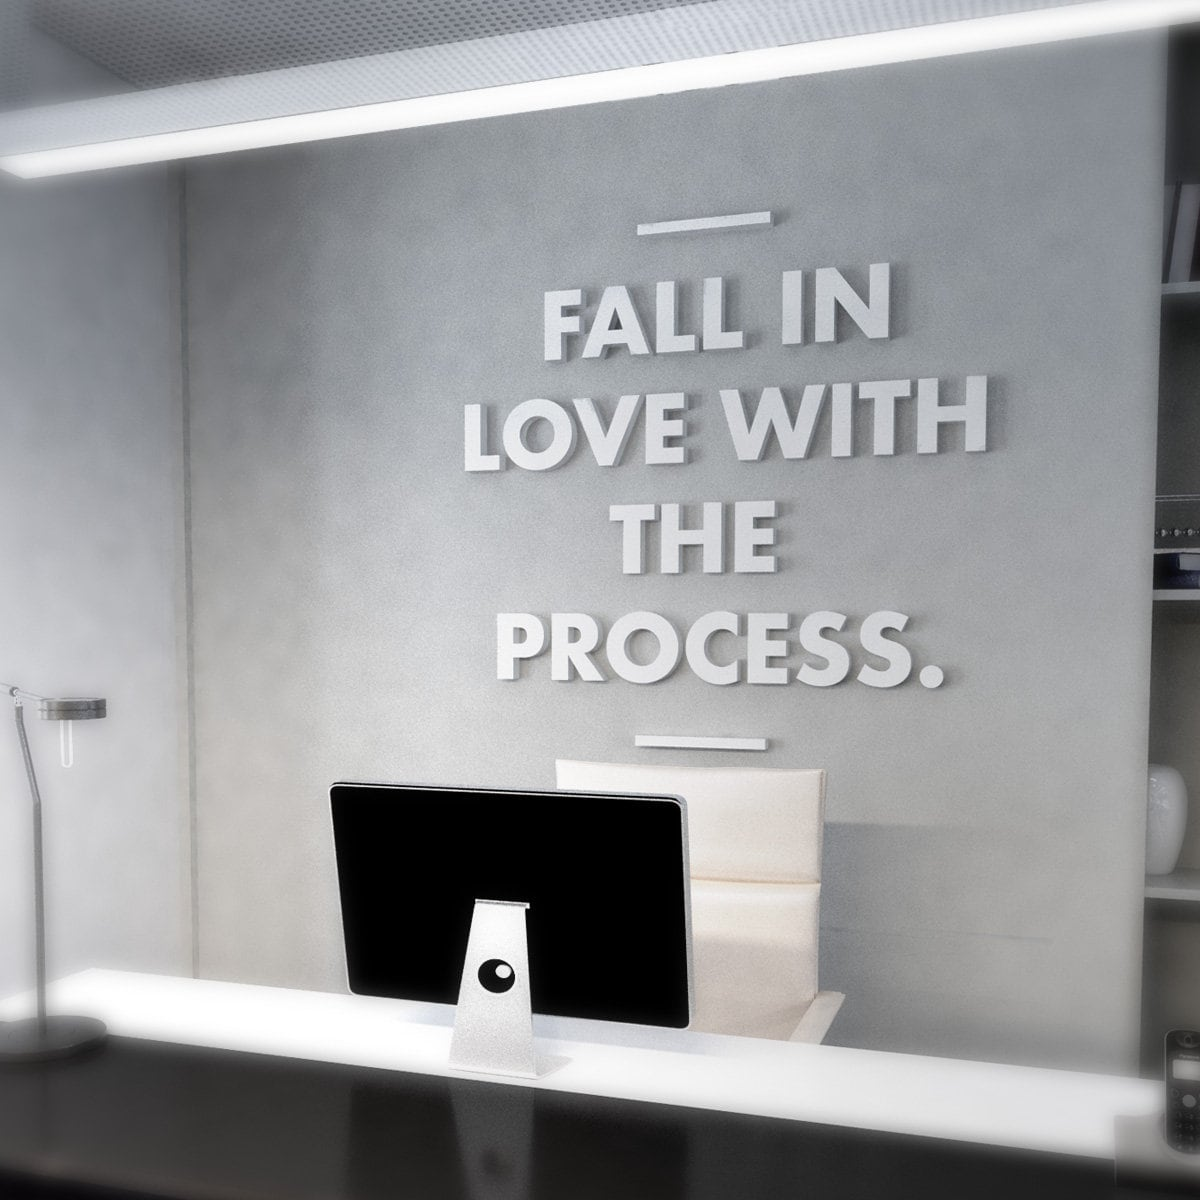 Charmant Office Walls Decor , Office Wall Art, Office Decor, Office Quote, Office,  Business Decor, Corporate Decor, Office Supplies   SKU:FILWP